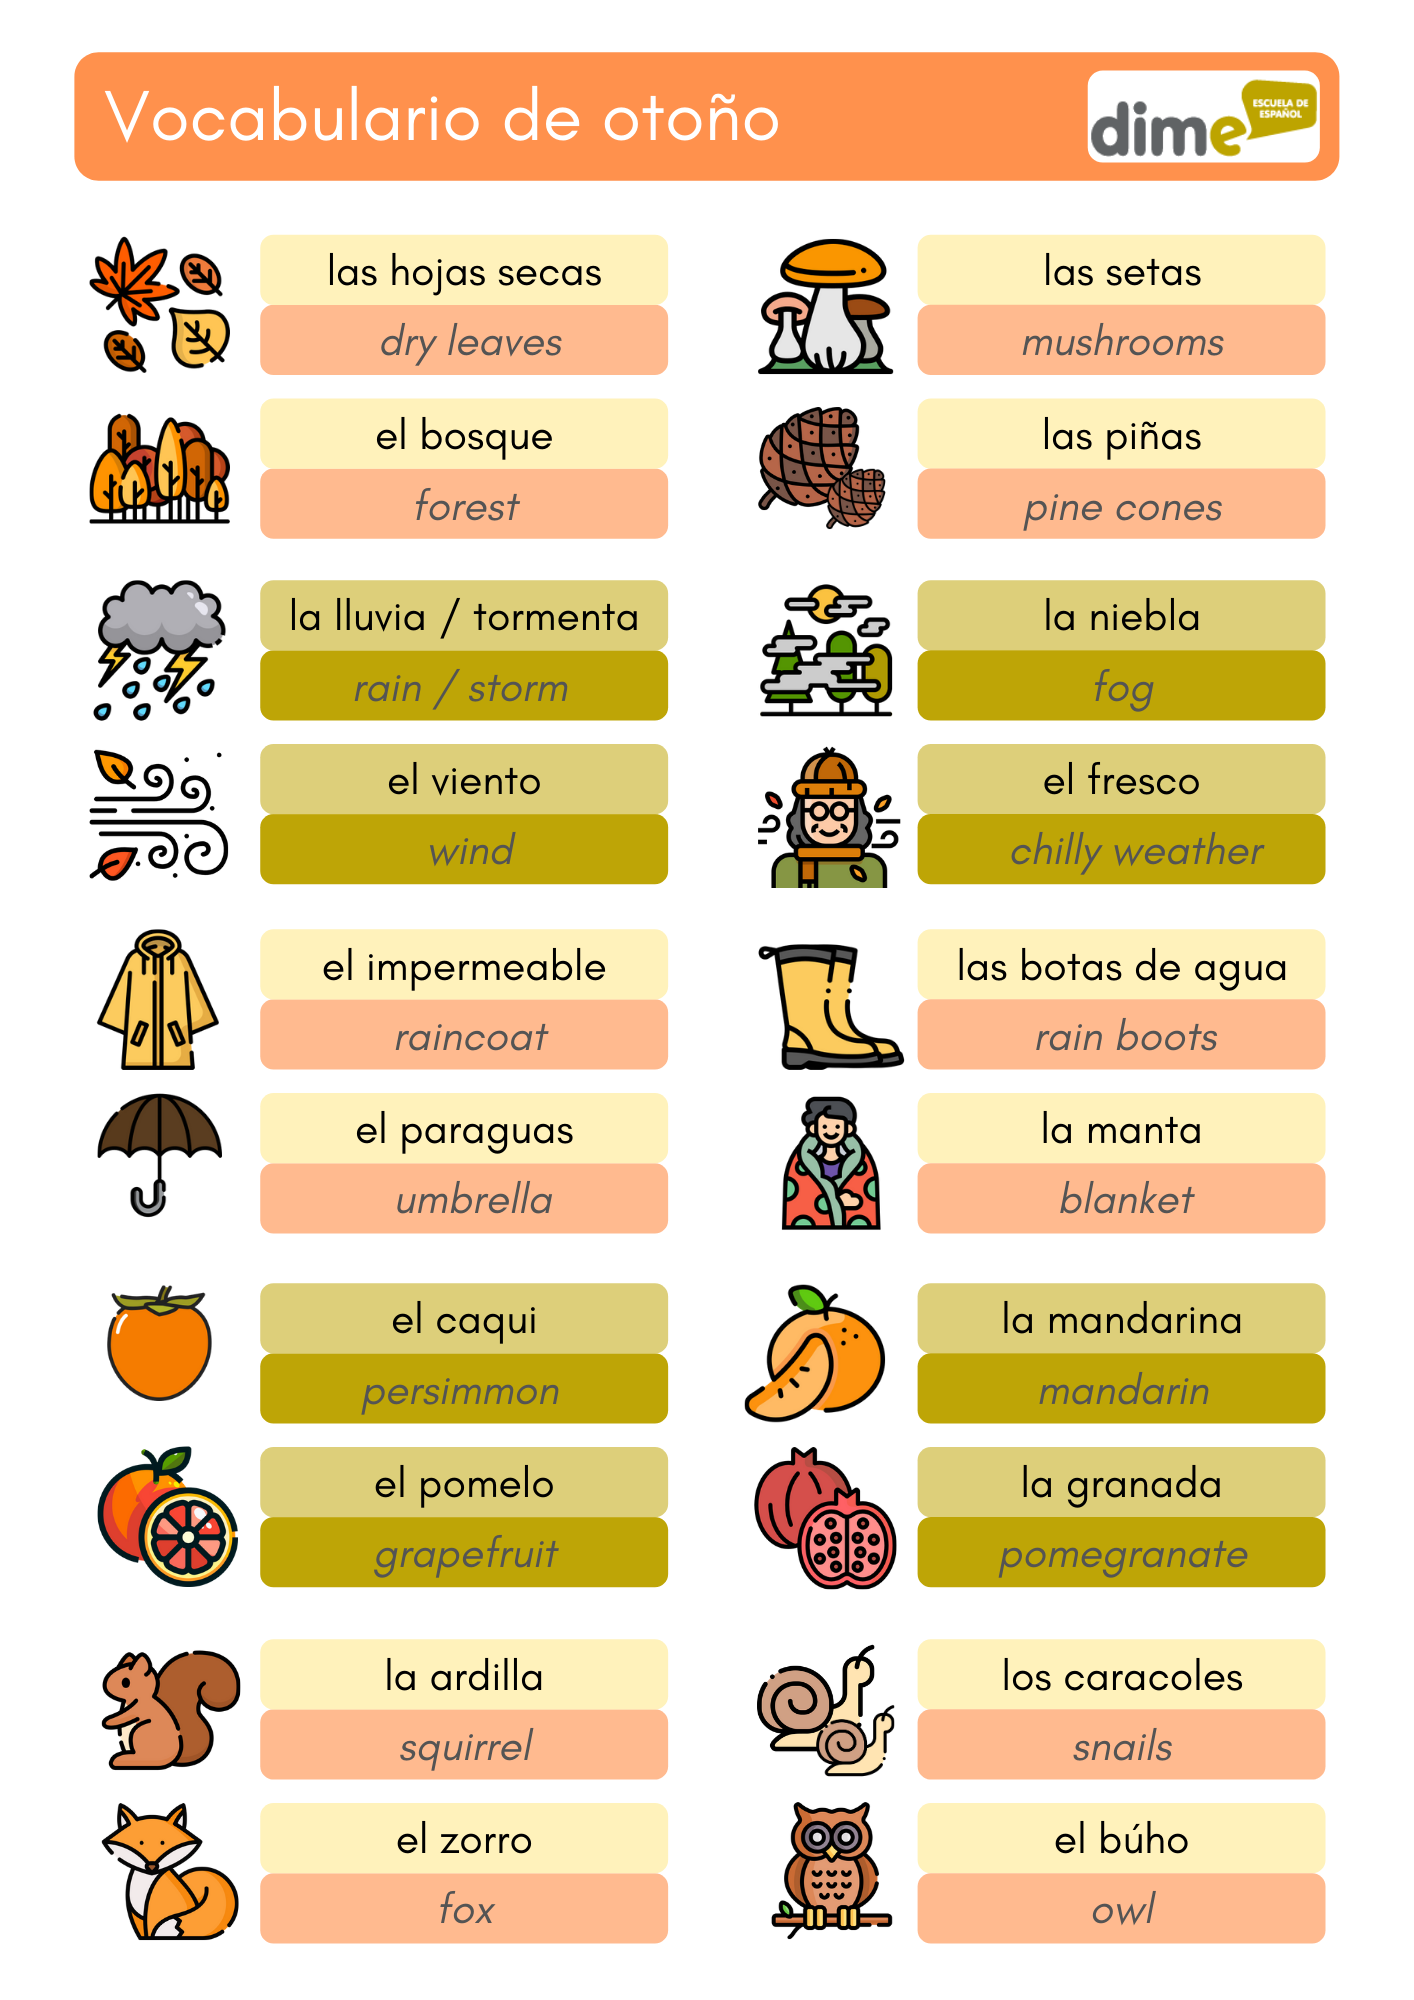 Vocabulario otoño autumn Spanish Dime